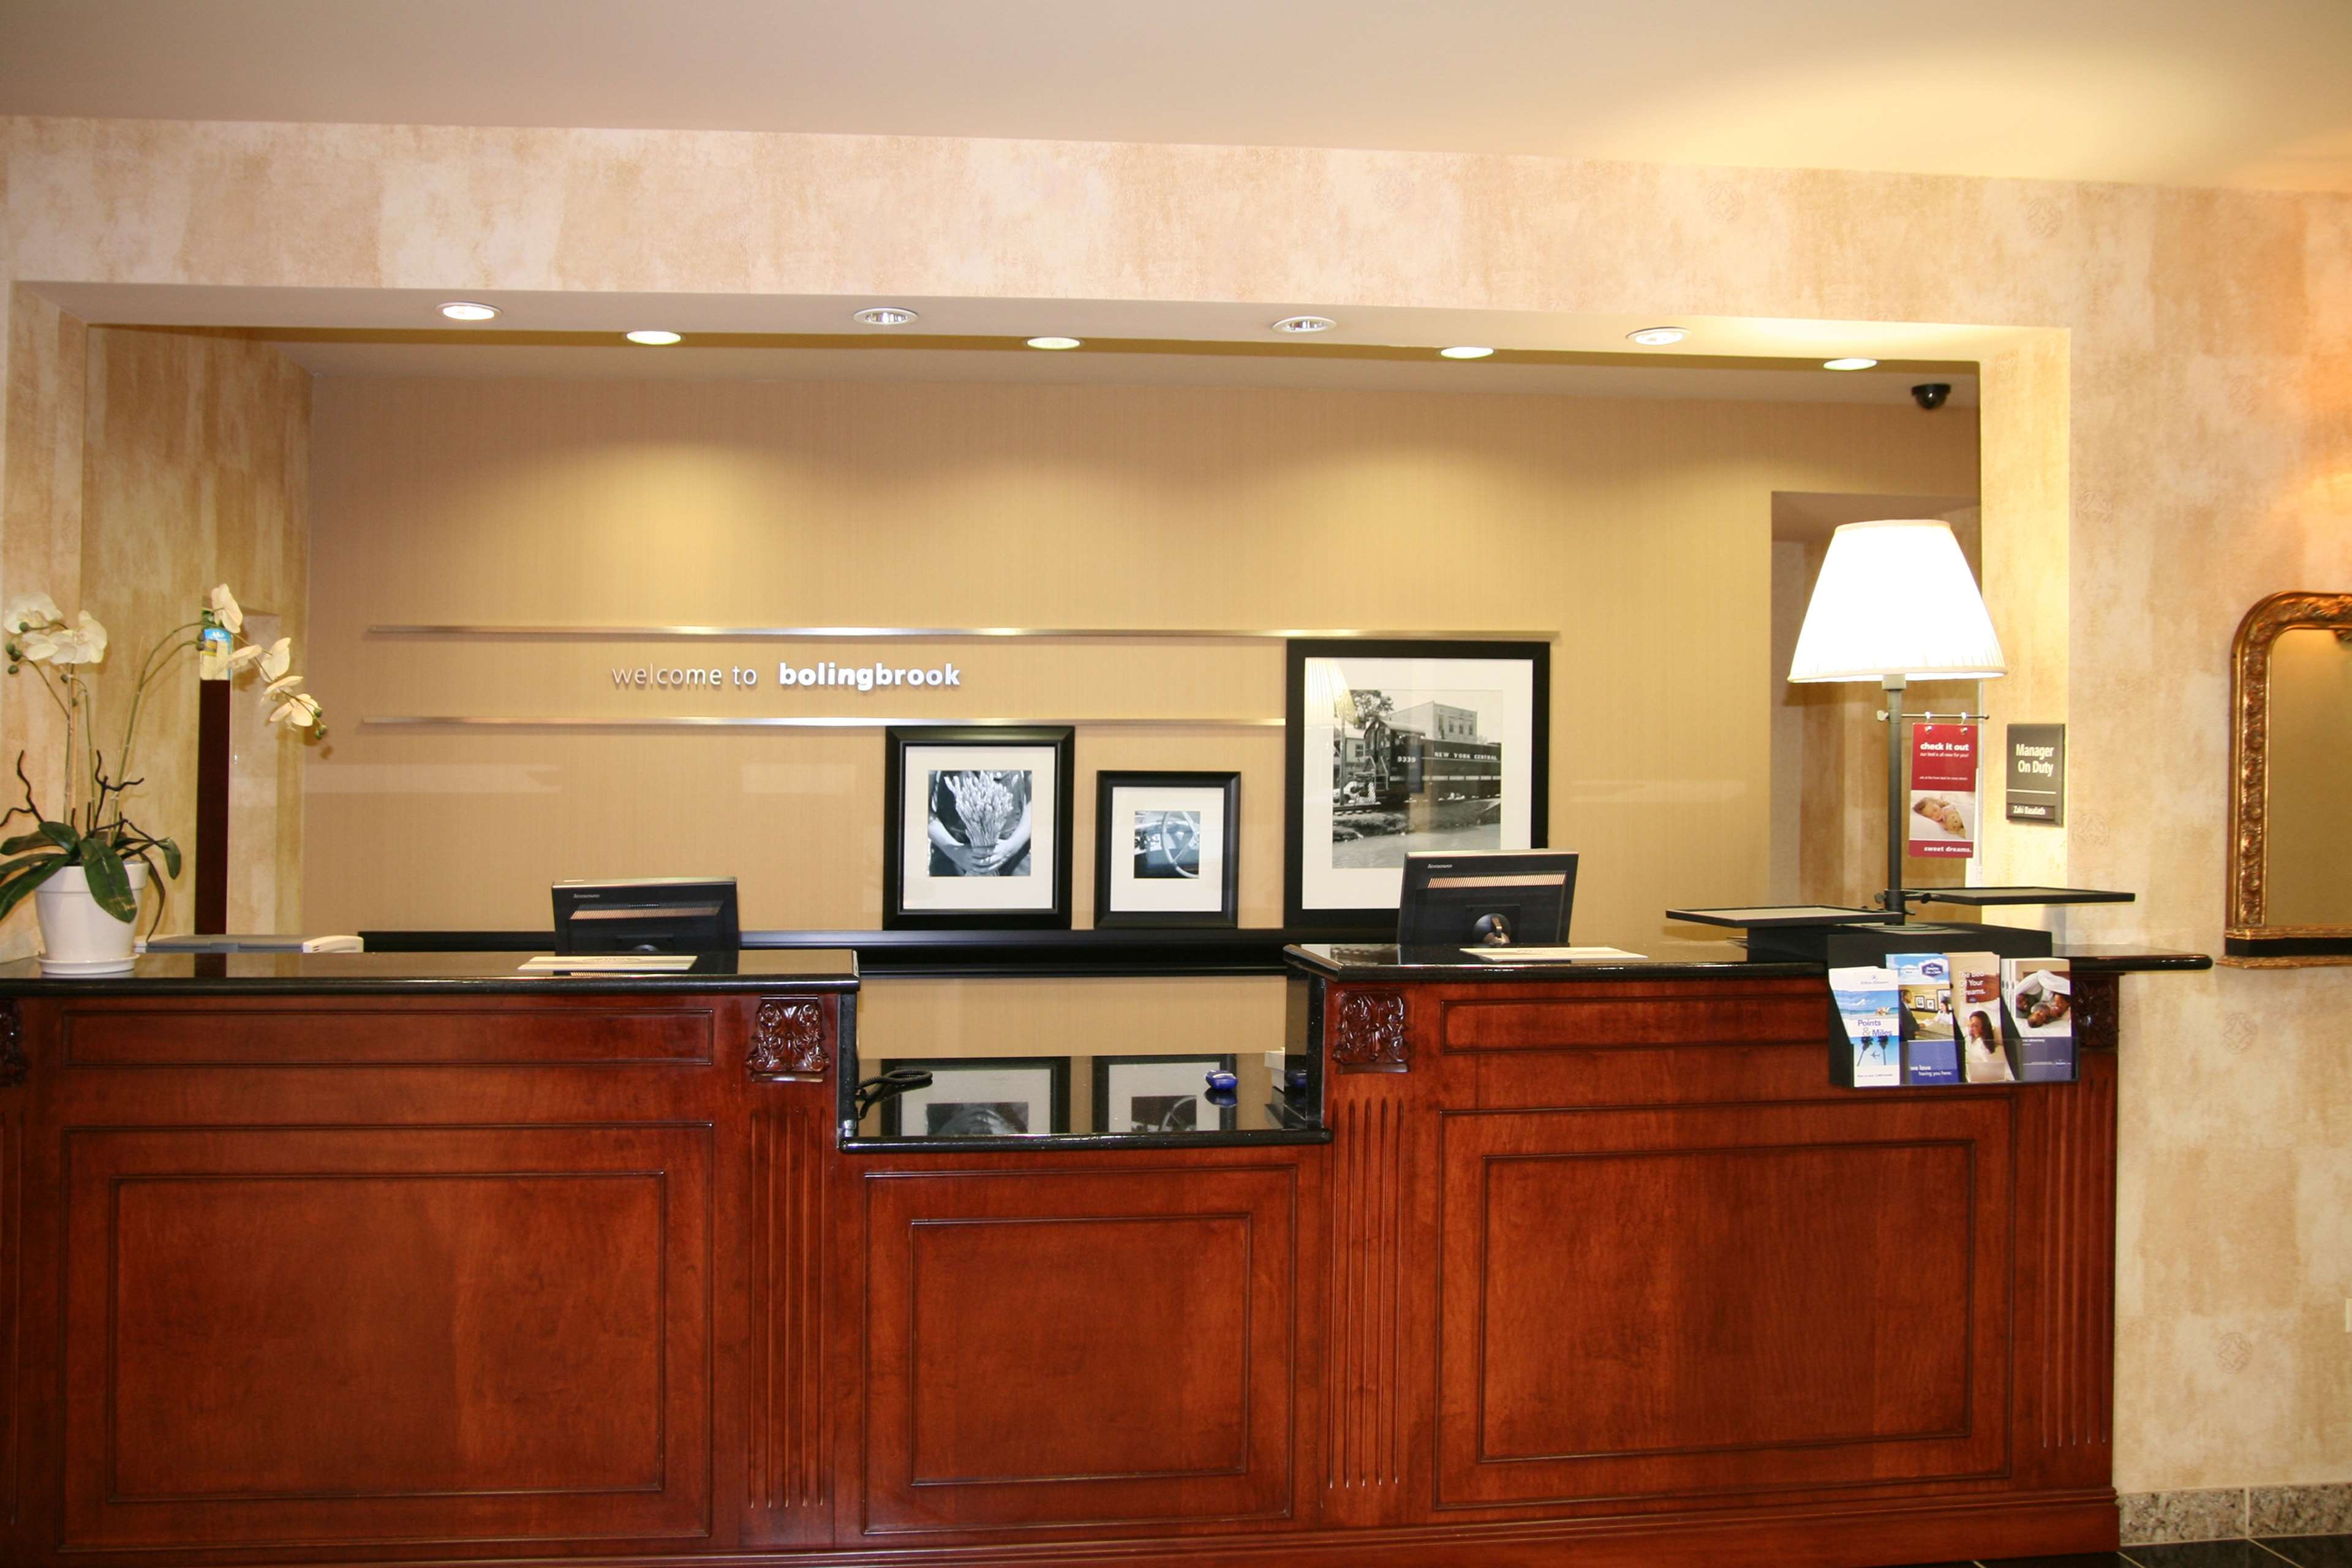 Hampton Inn & Suites Bolingbrook image 5